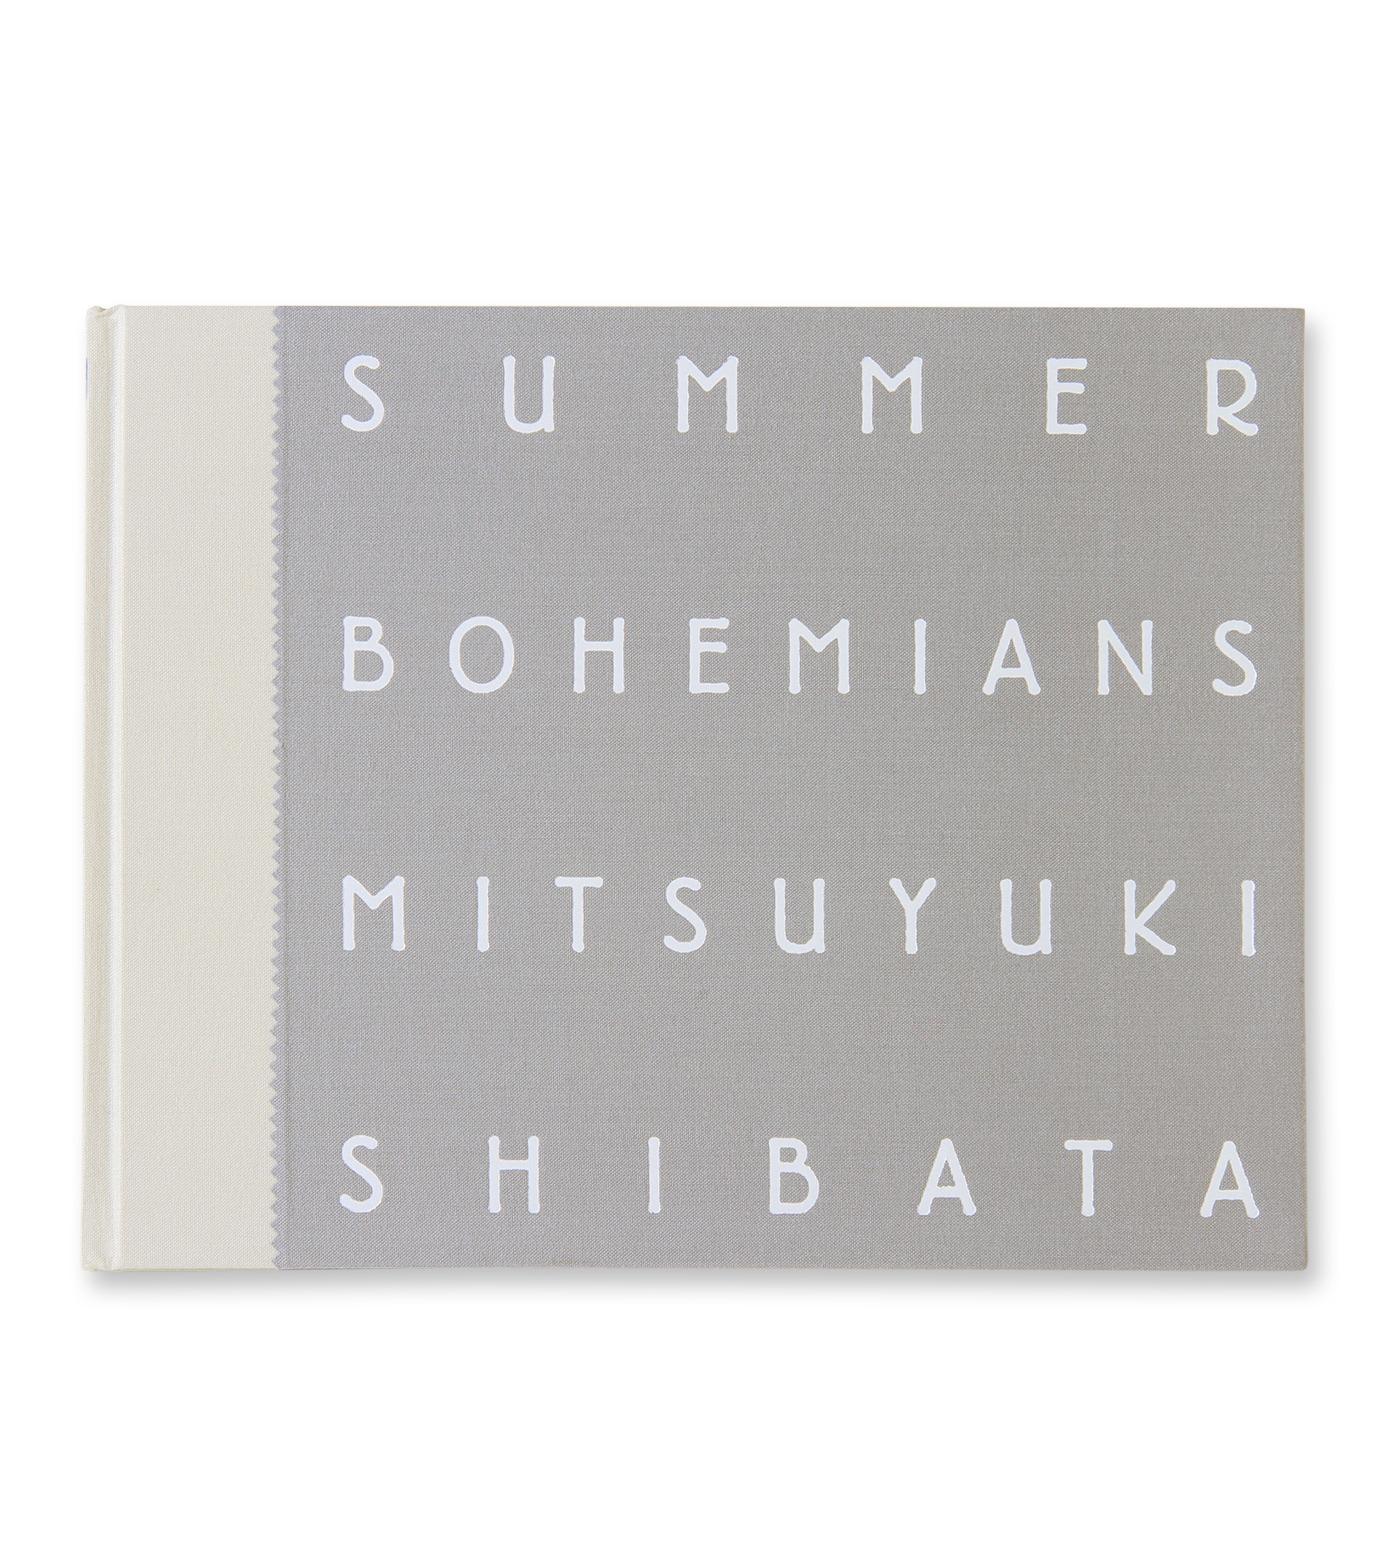 Bueno!Books(ブエノ! ブックス)のSummer bohemians-NONE-Bohemians-0 拡大詳細画像1